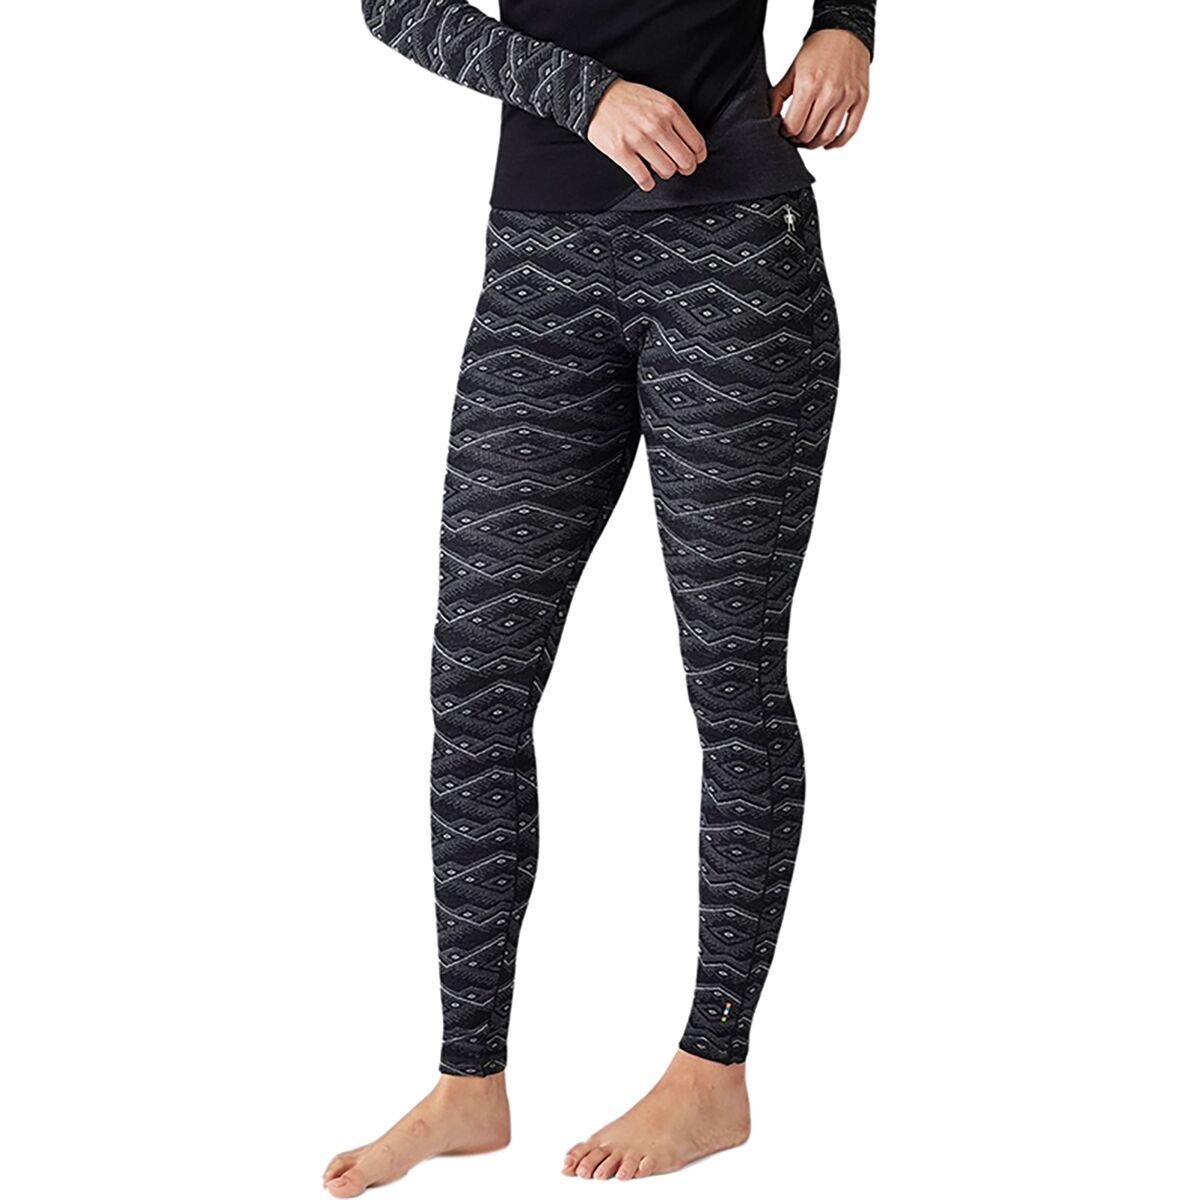 Merino 250 Baselayer Pattern Bottom - Women